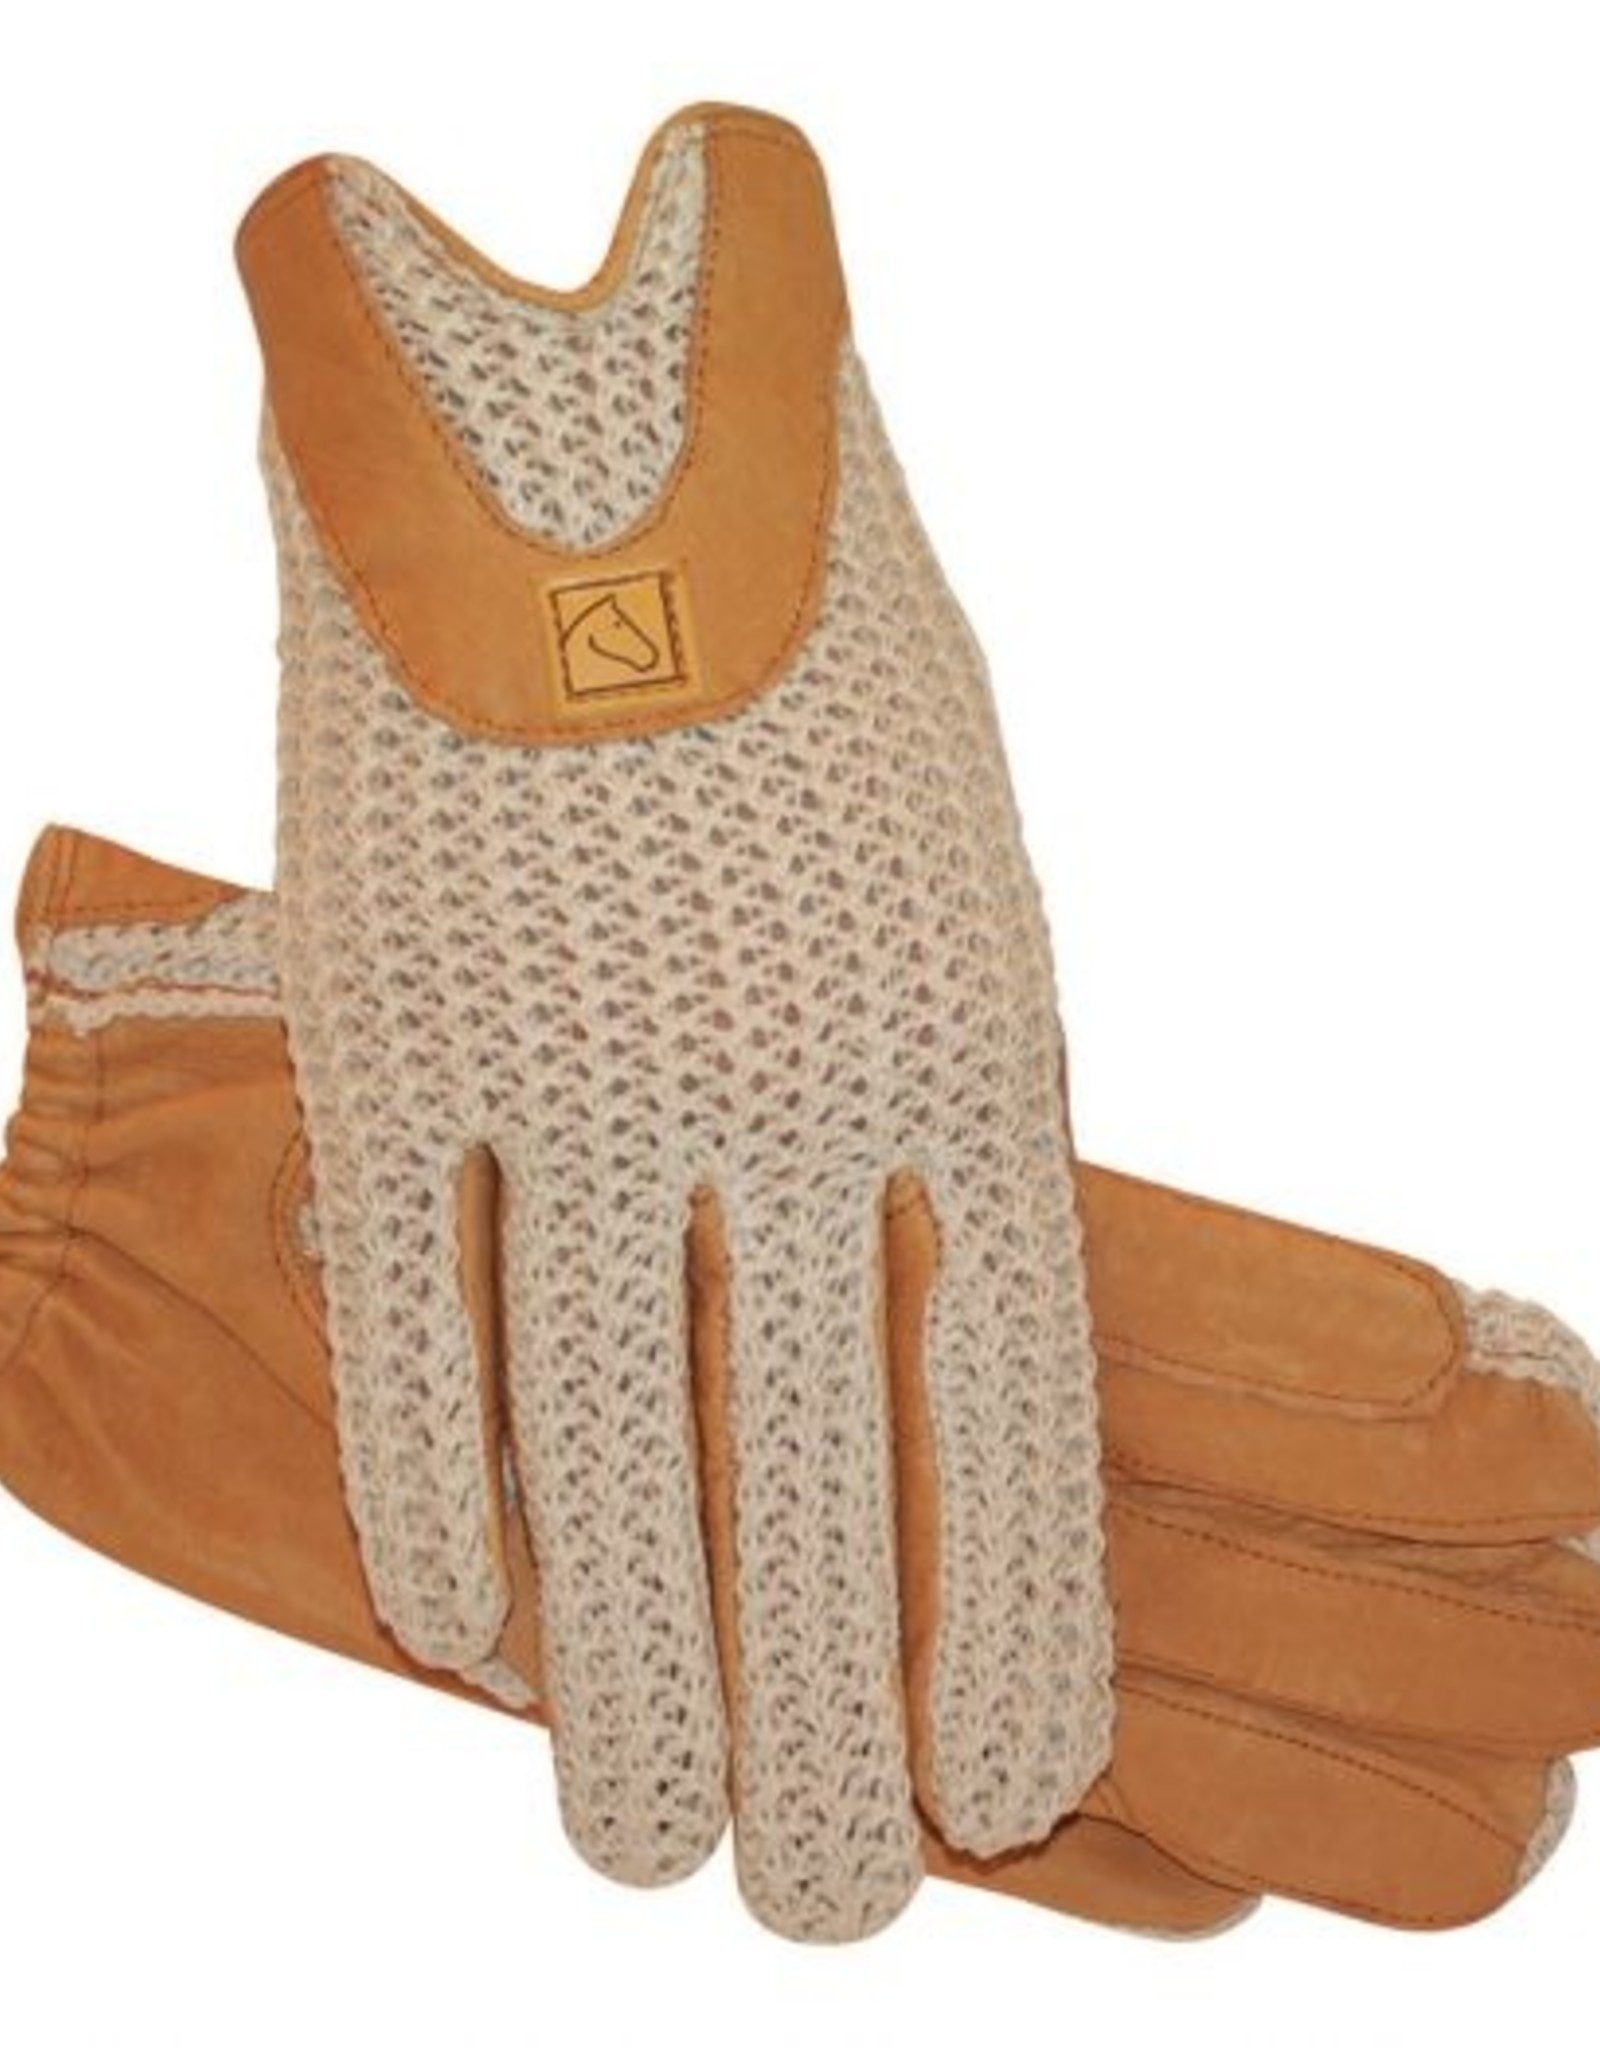 SSG Lycrochet Horseshoe Back Glove